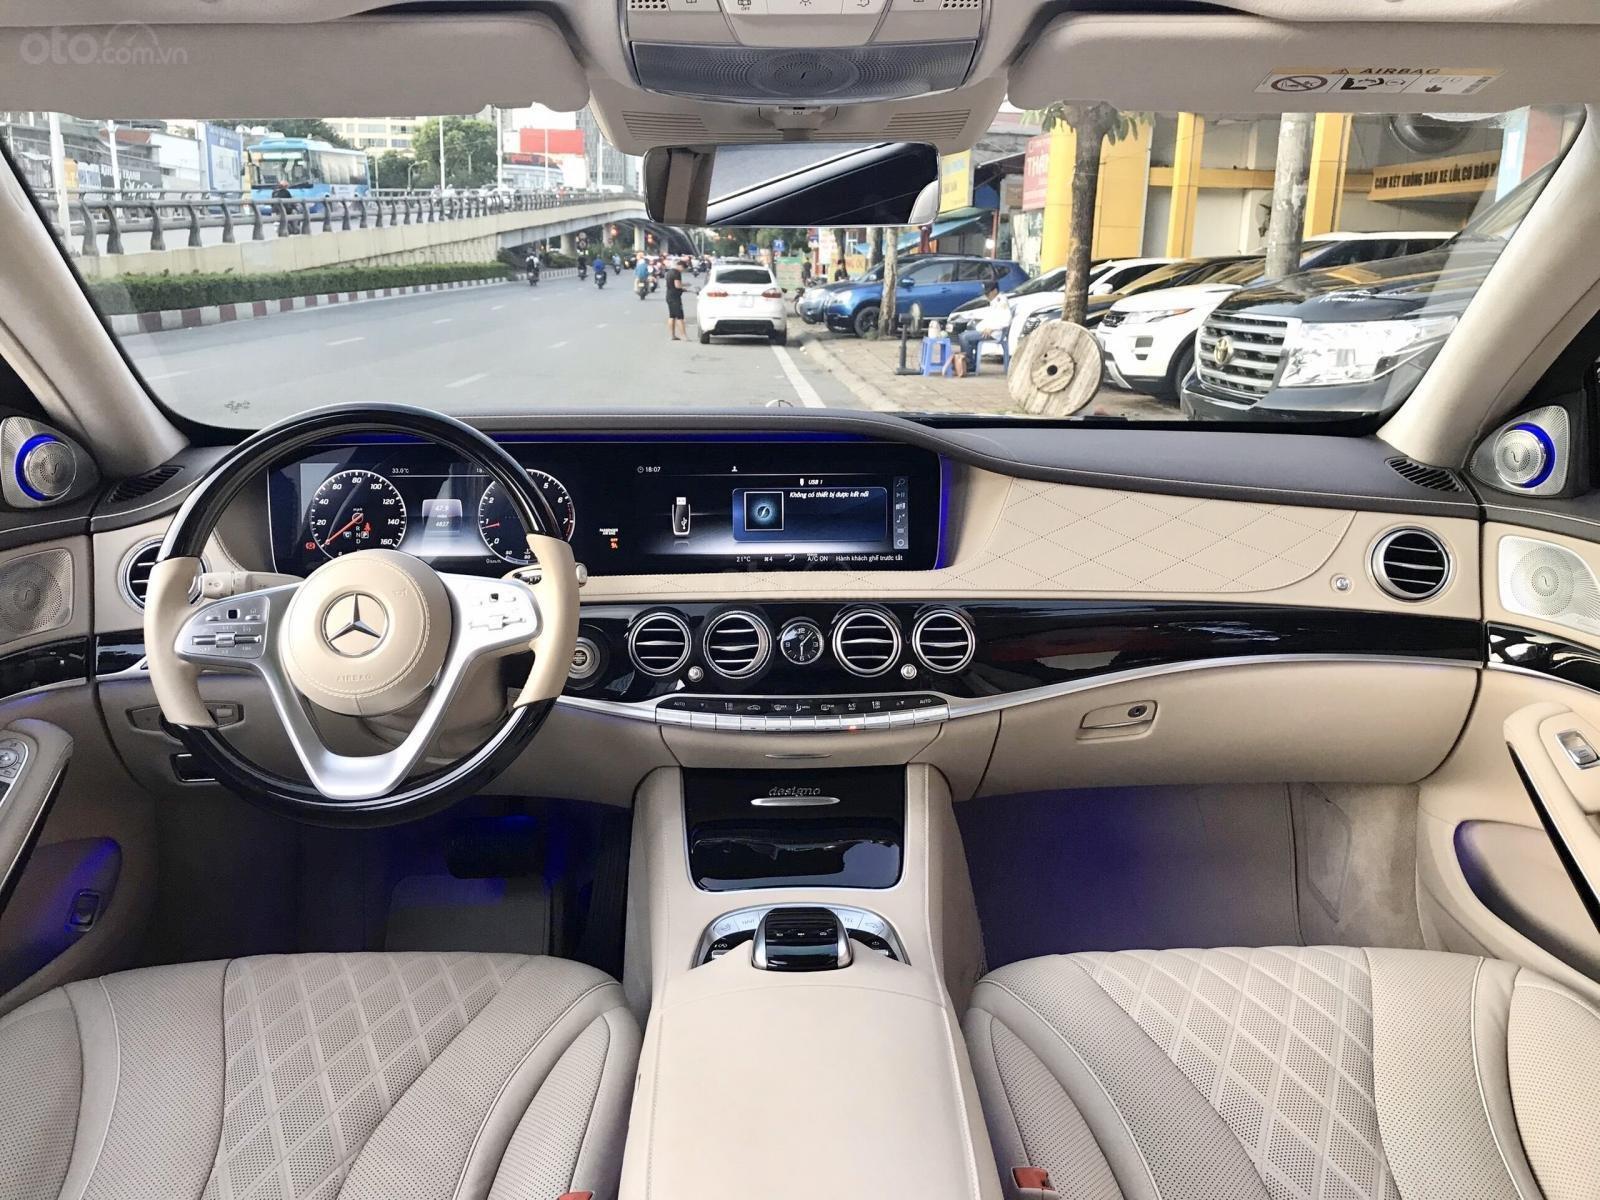 Mercedes Benz S450 Luxury sản xuất 2019 (8)